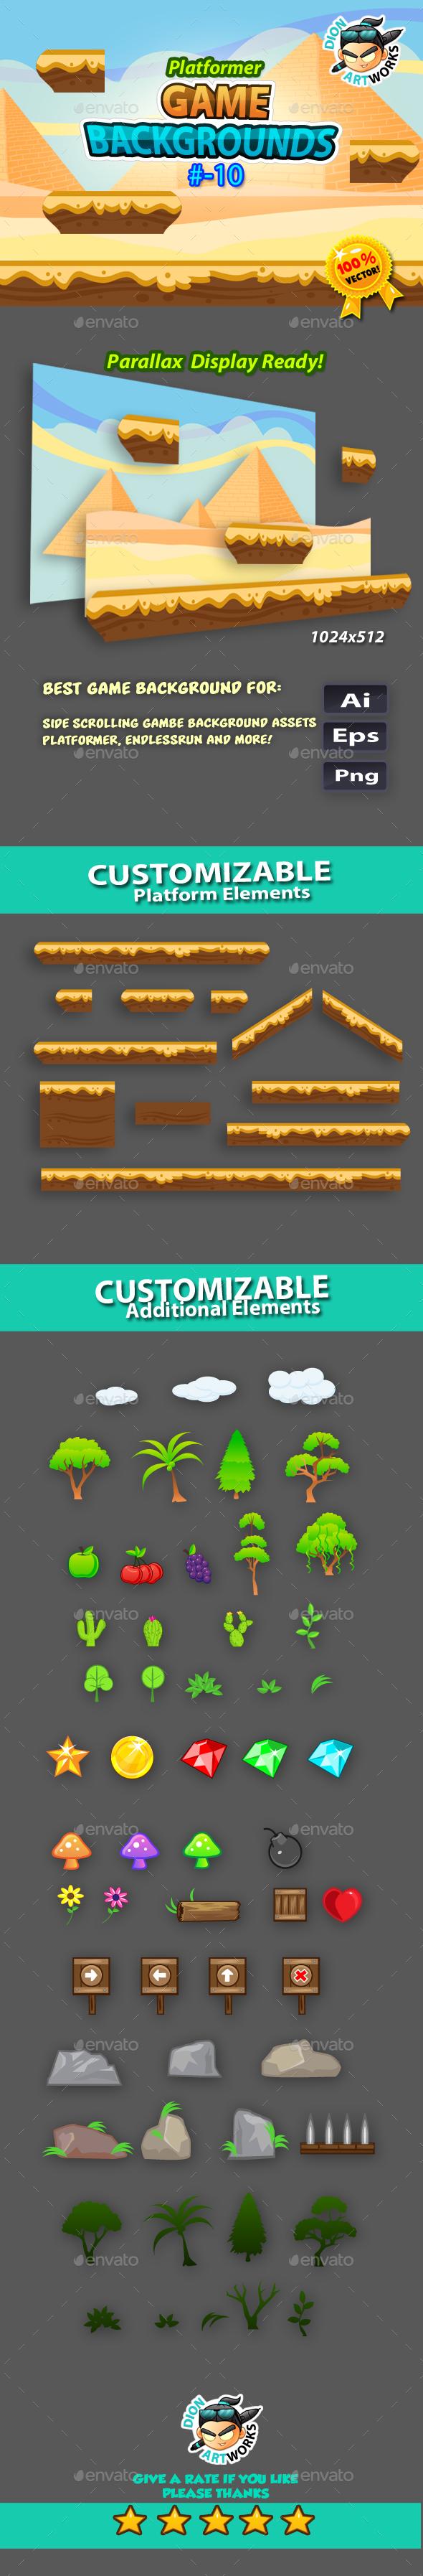 Plaftormer Game Backgrounds10 - Backgrounds Game Assets